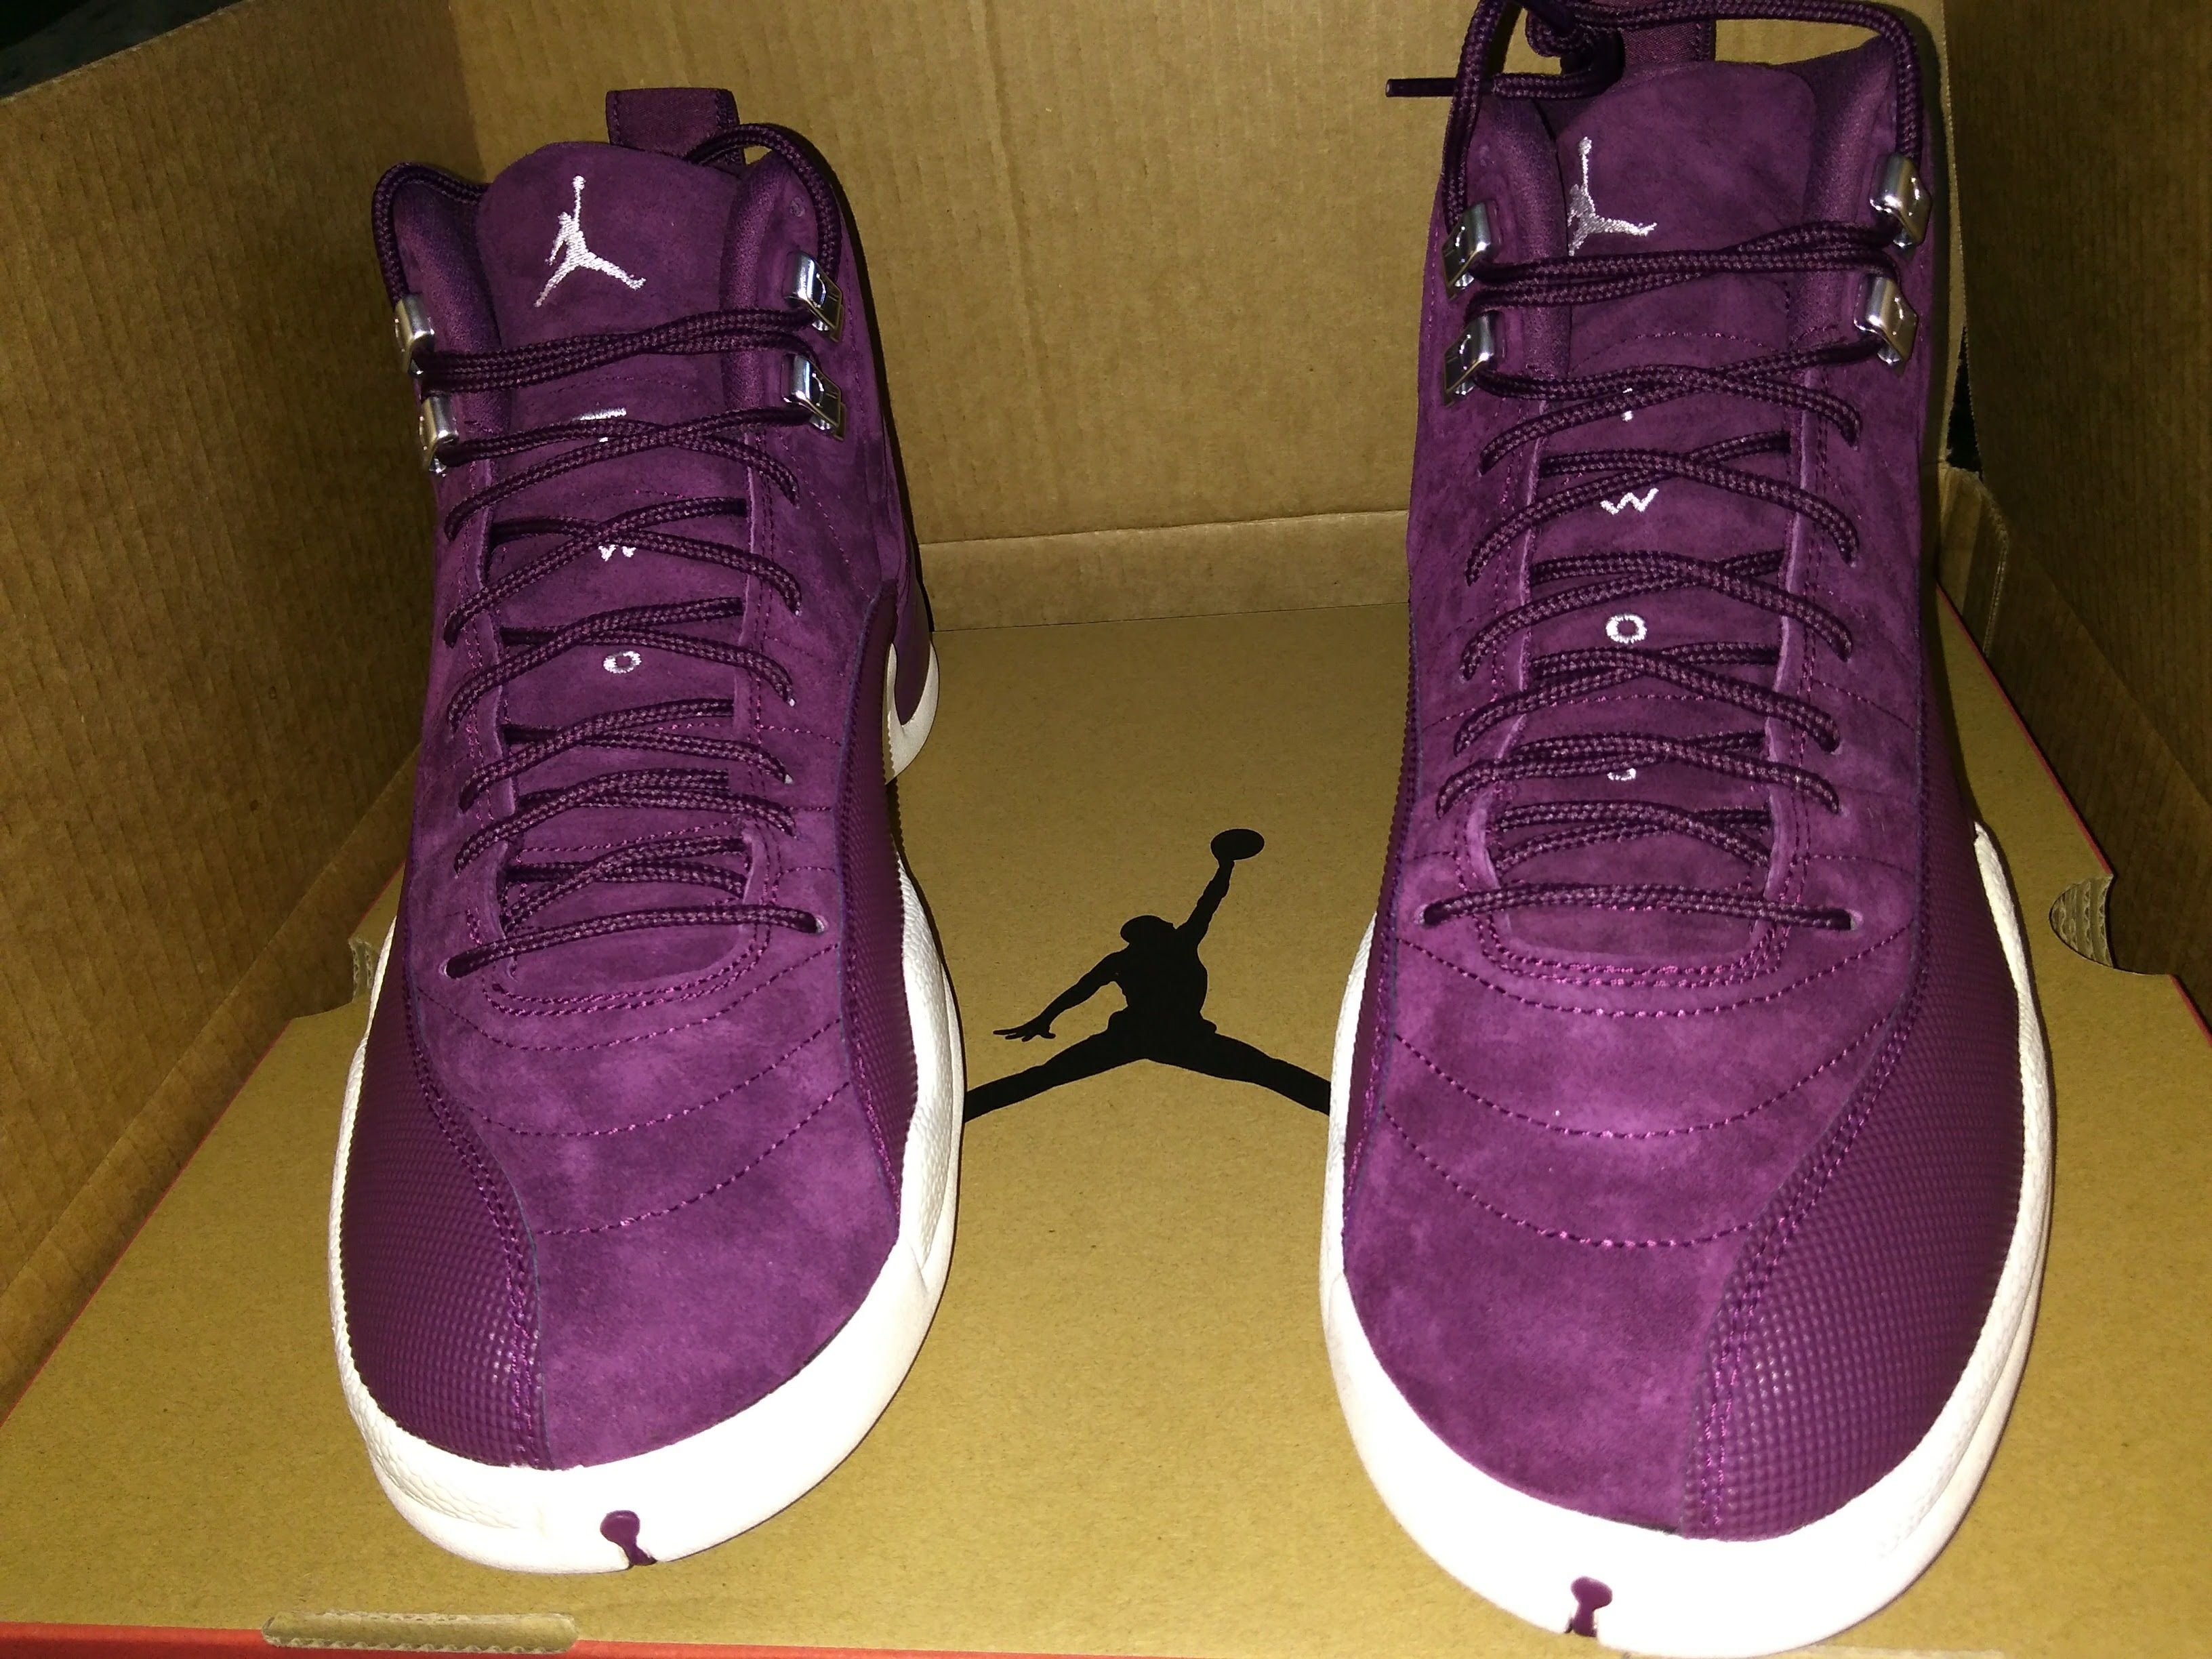 #Jordan12Bordeaux #Nike #Jordansneaker - https://drewrynewsnetwork.com/forum/shoe-reviews/sneaker-reviews